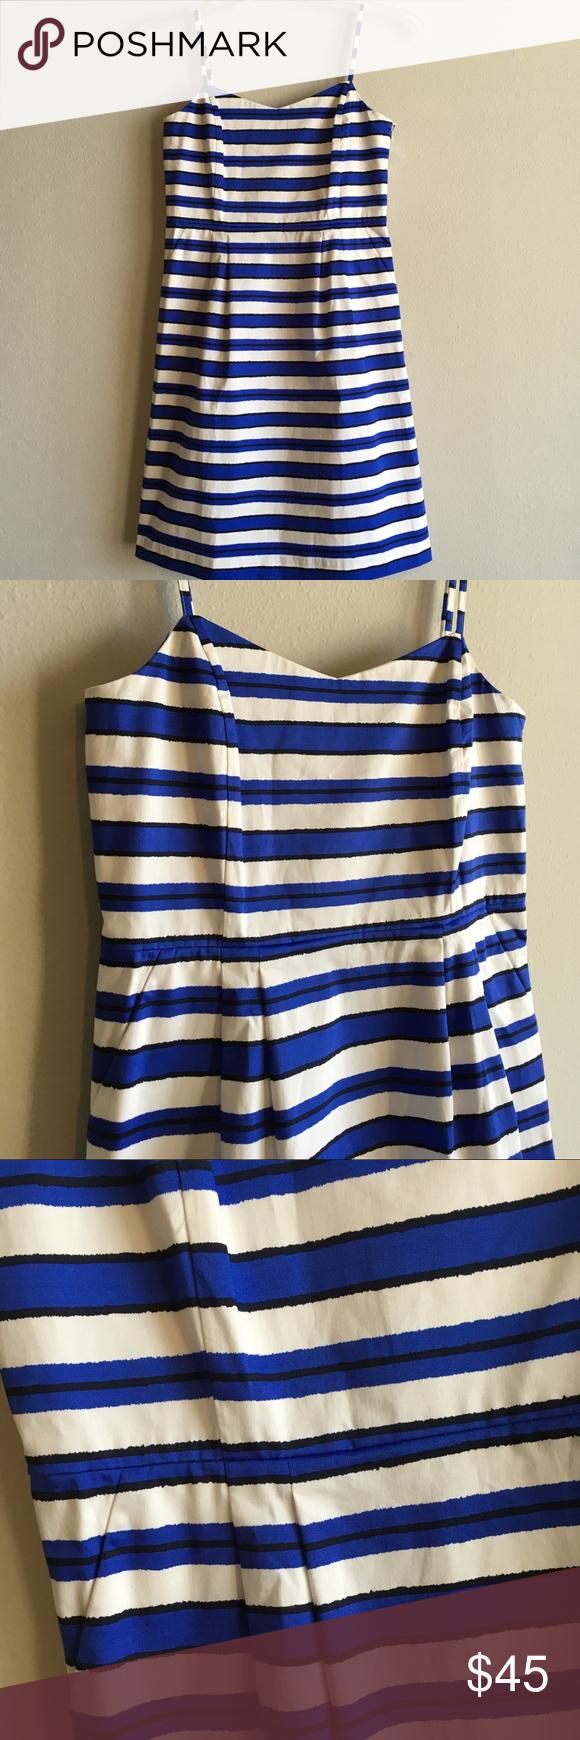 Nwt Gap Striped Tank Pockets Sleeveless Sun Dress A Bright